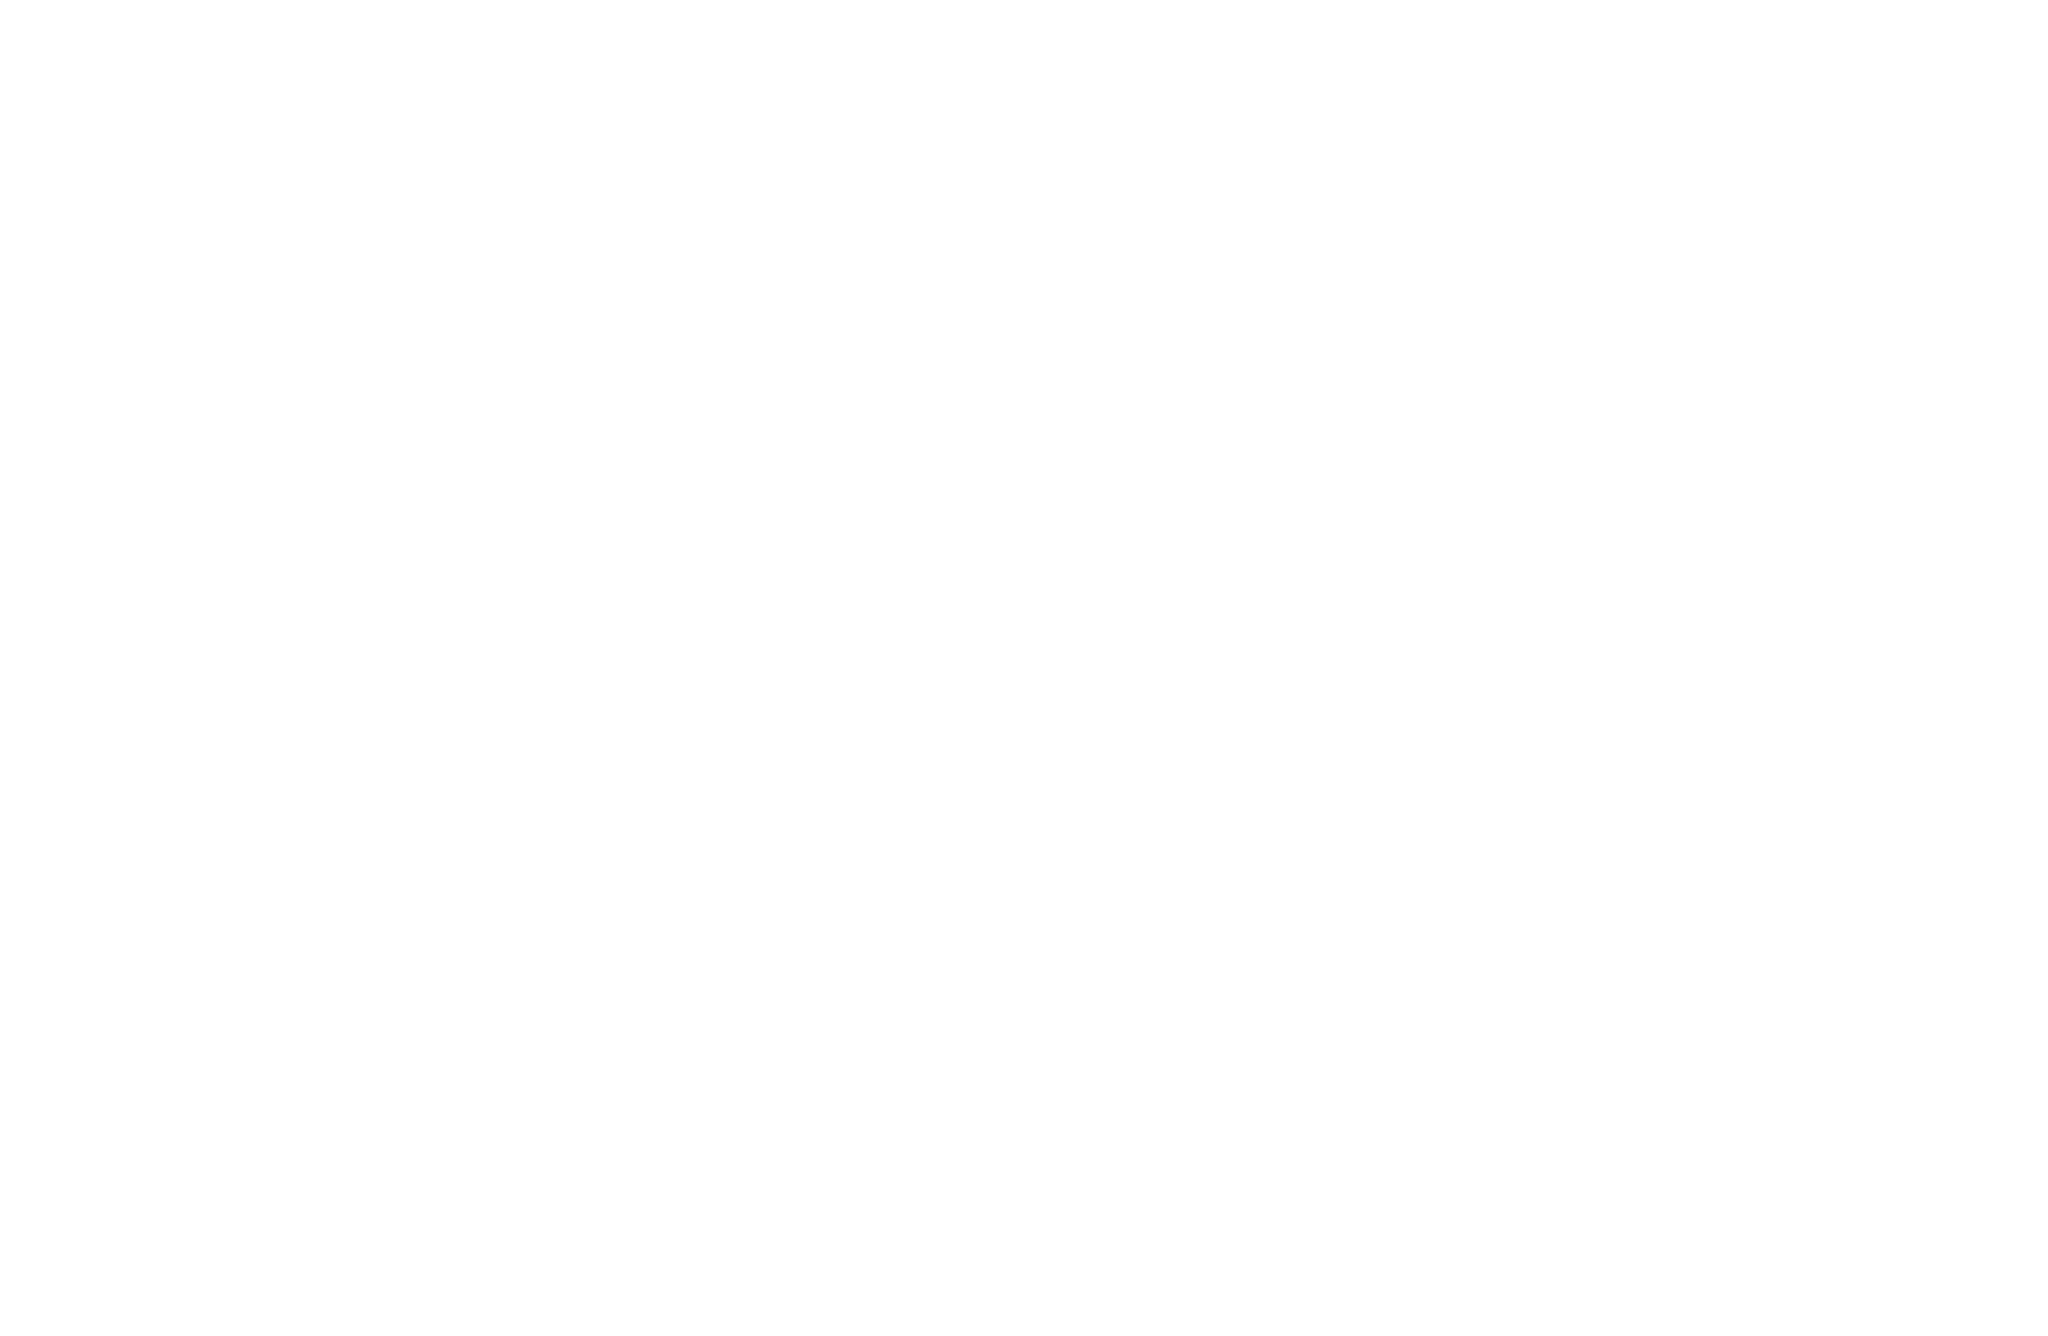 arabco-eg.com